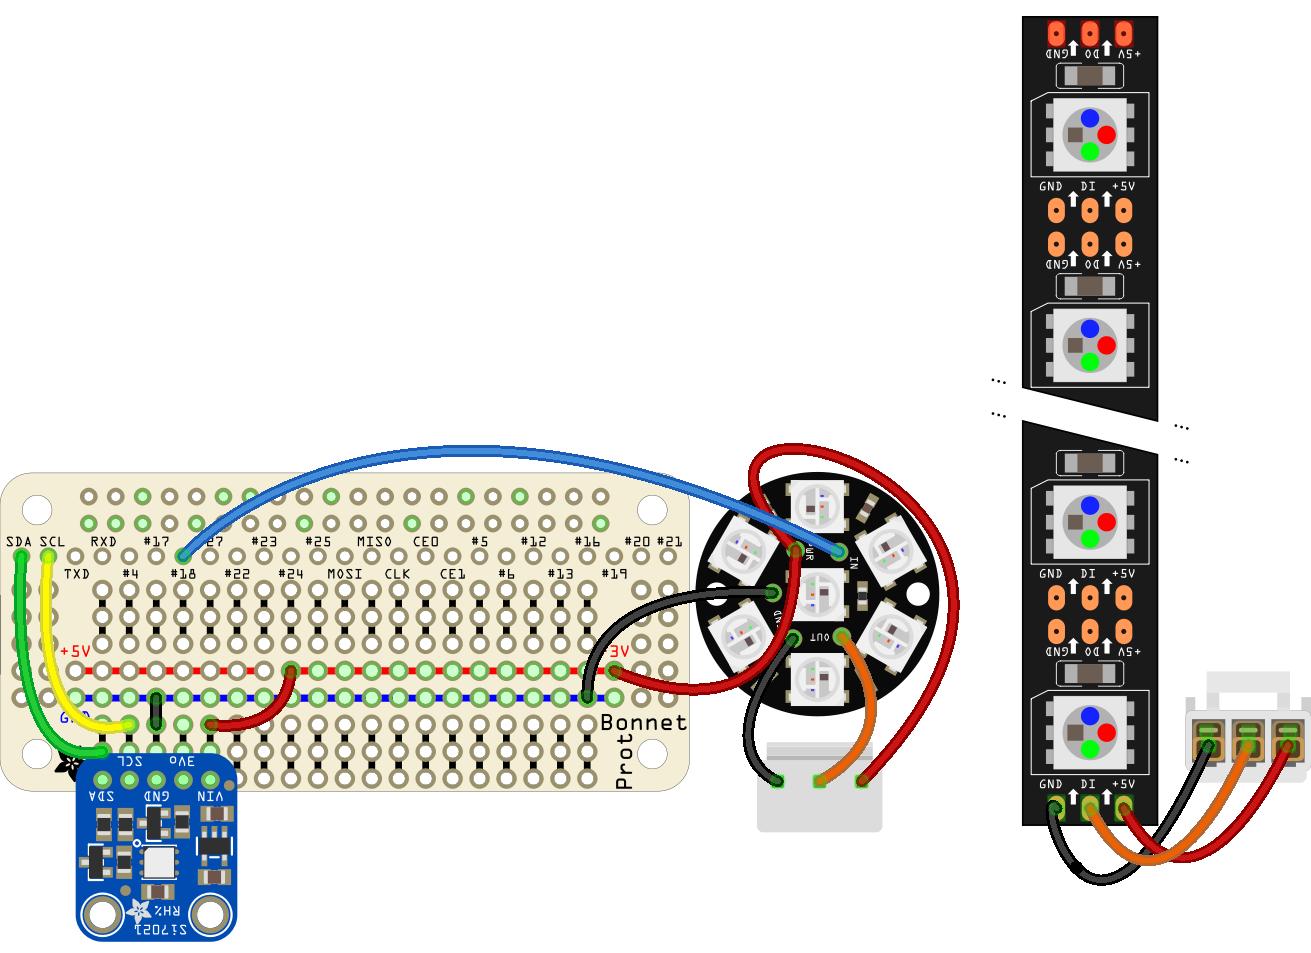 raspberry_pi_py-wiring.png